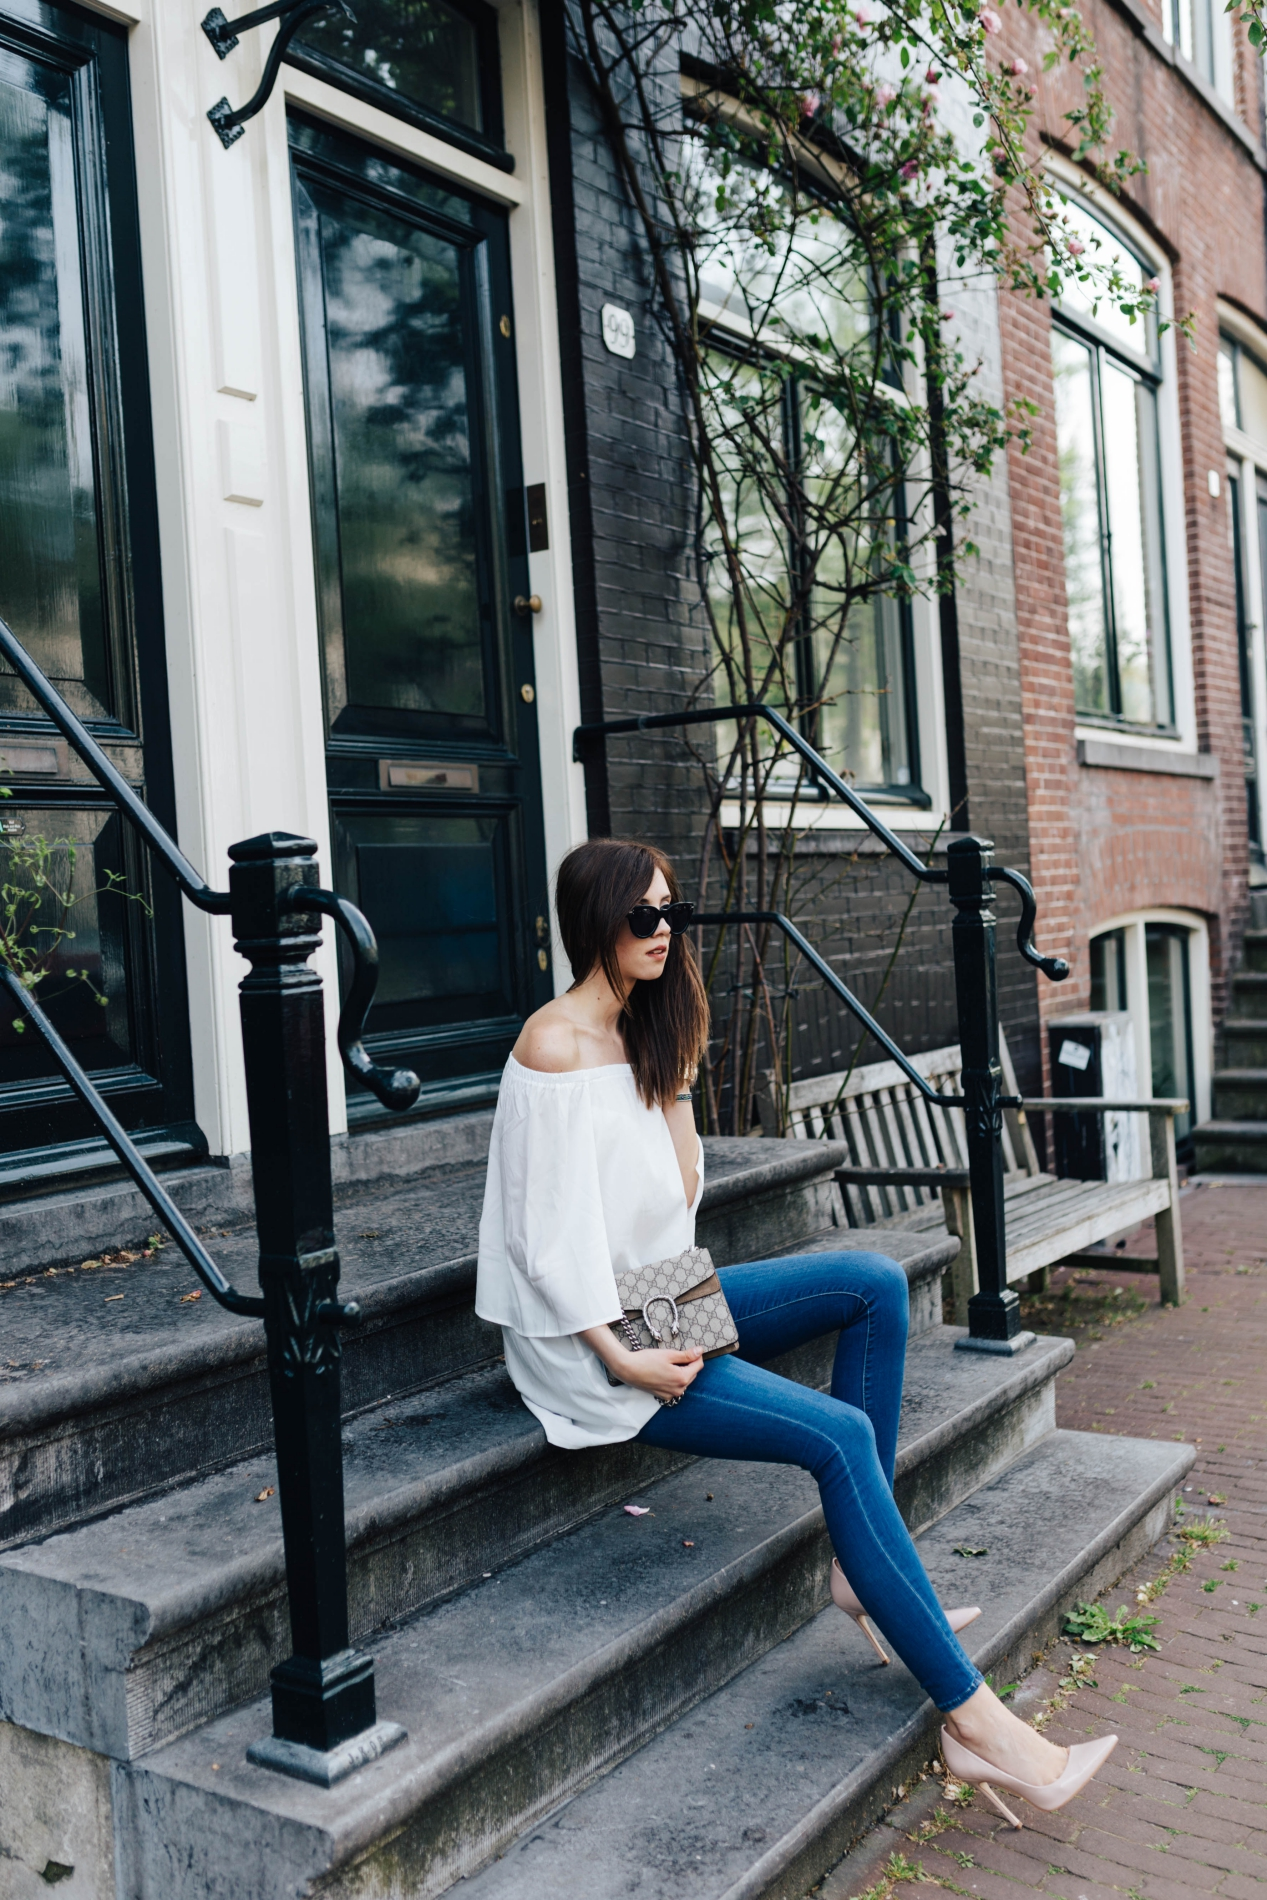 amsterdamphotowalk-90